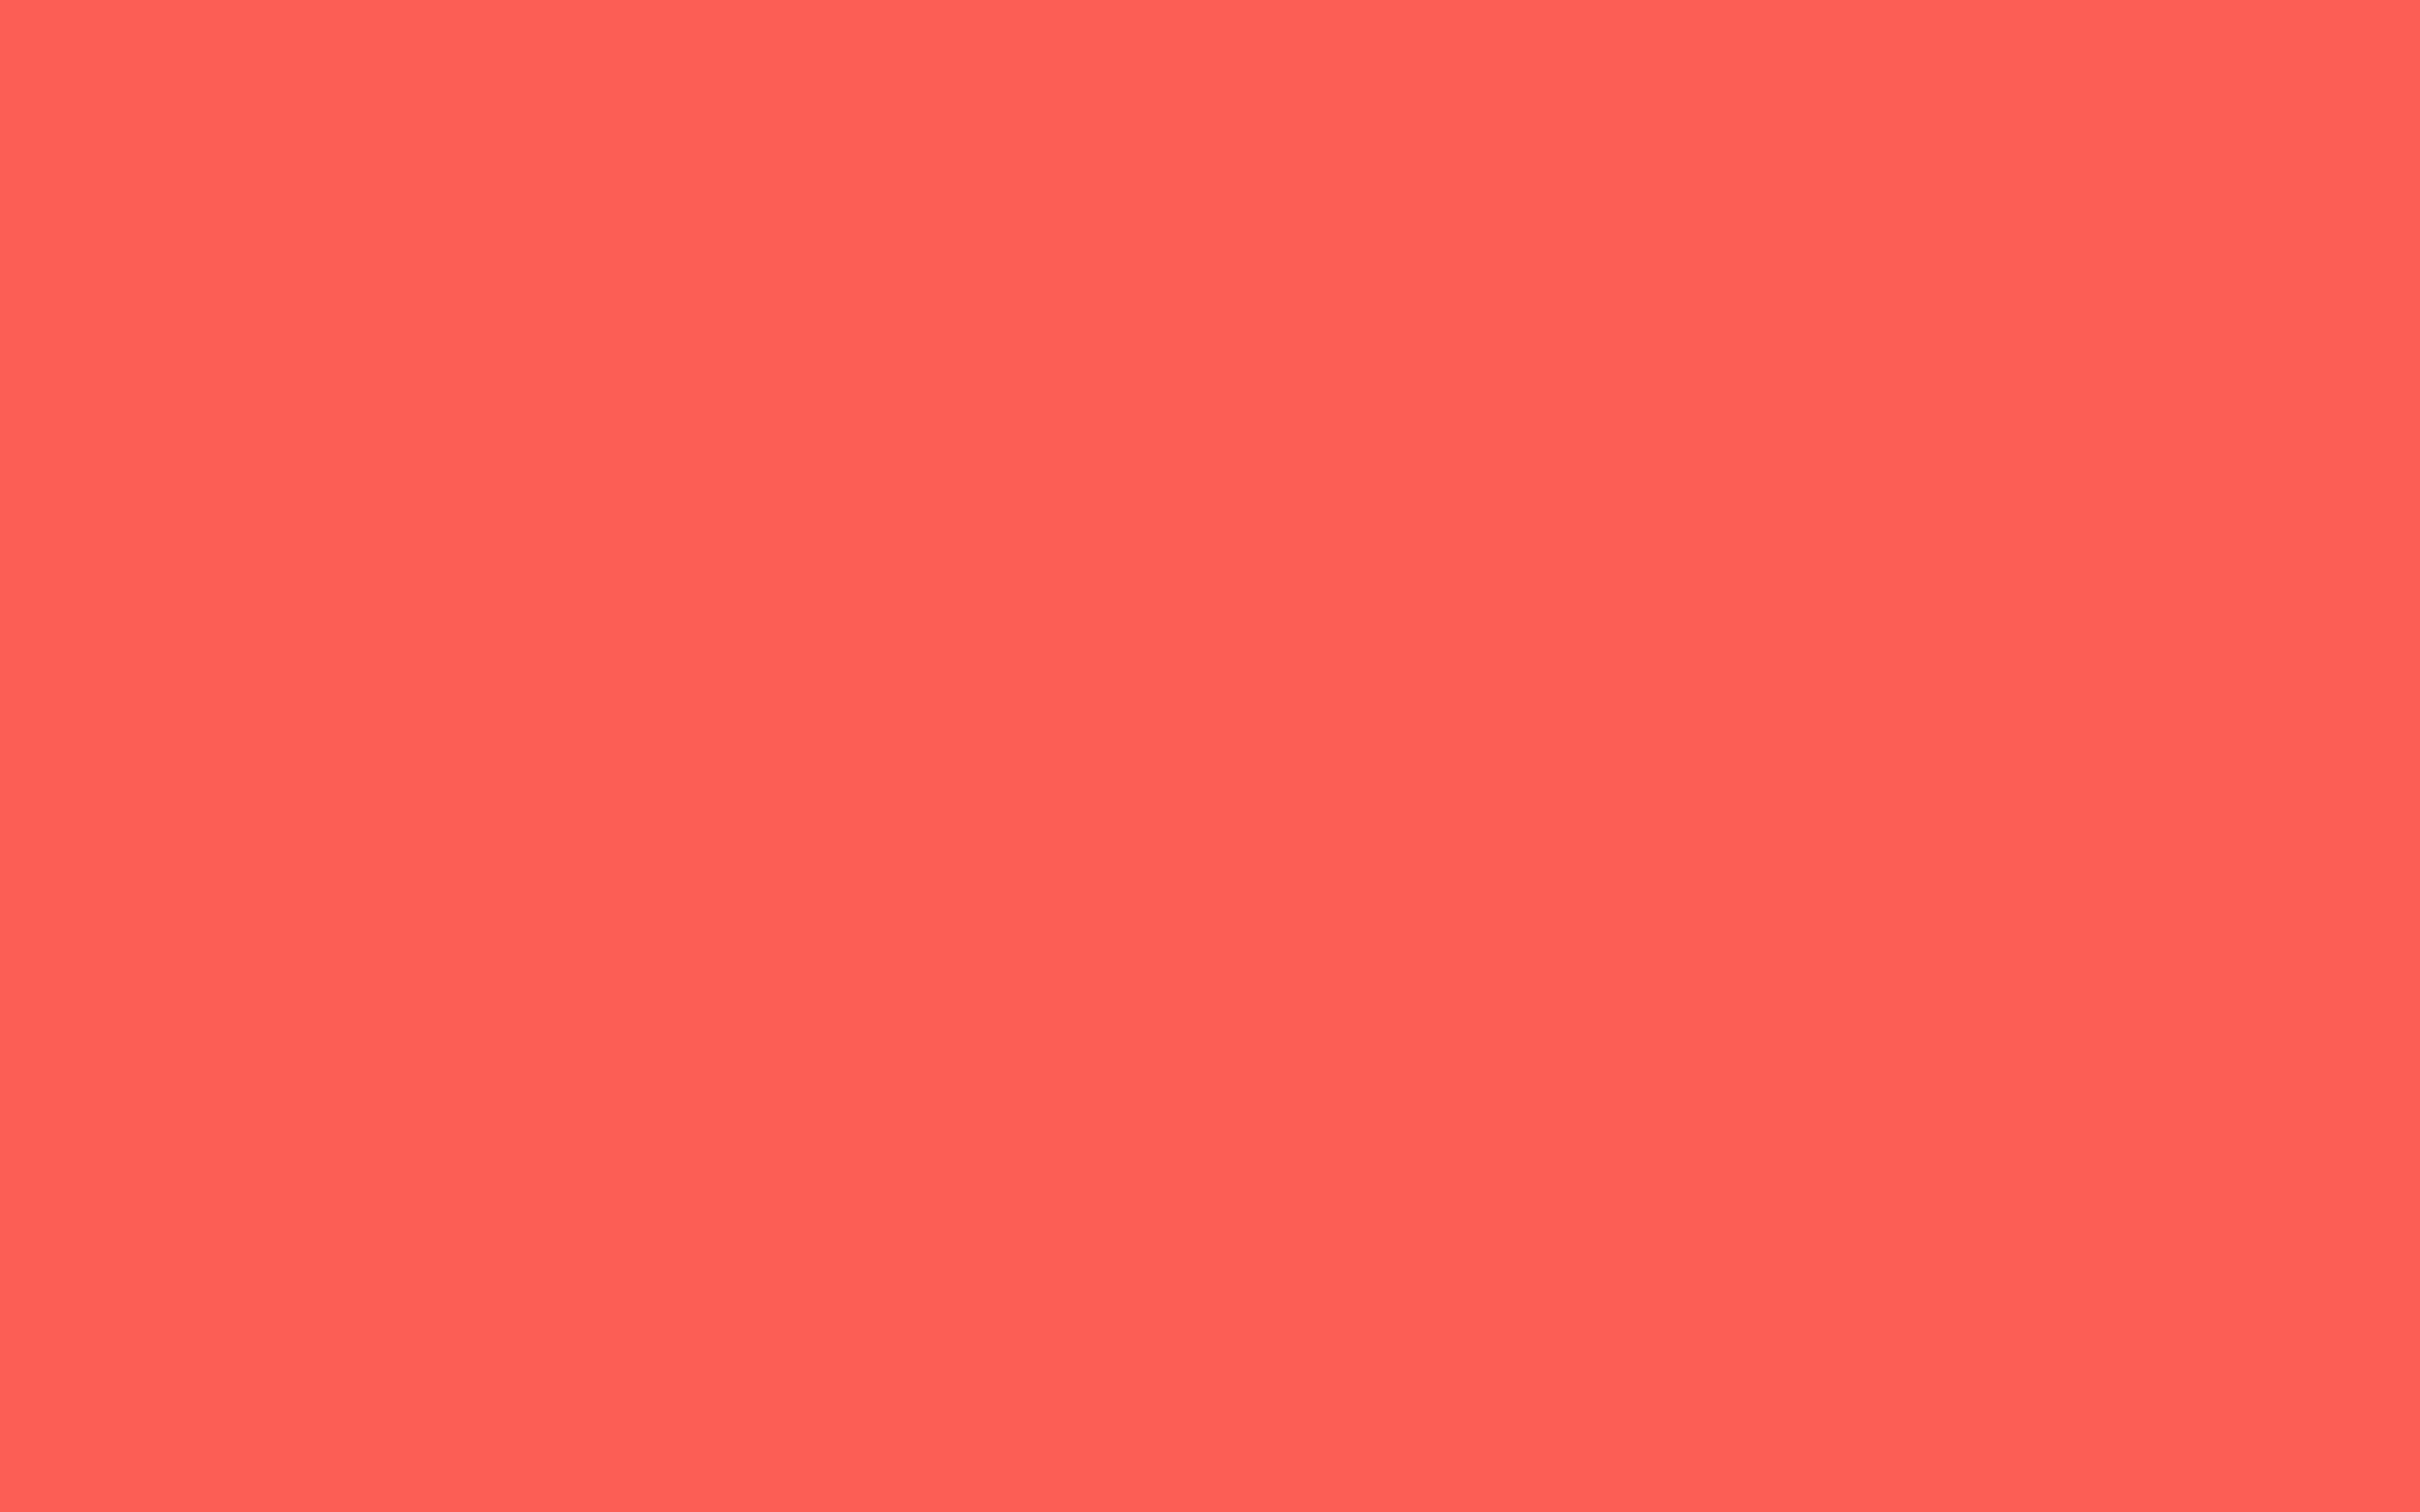 Neon Orange Color Background Neon orange co 2560x1600